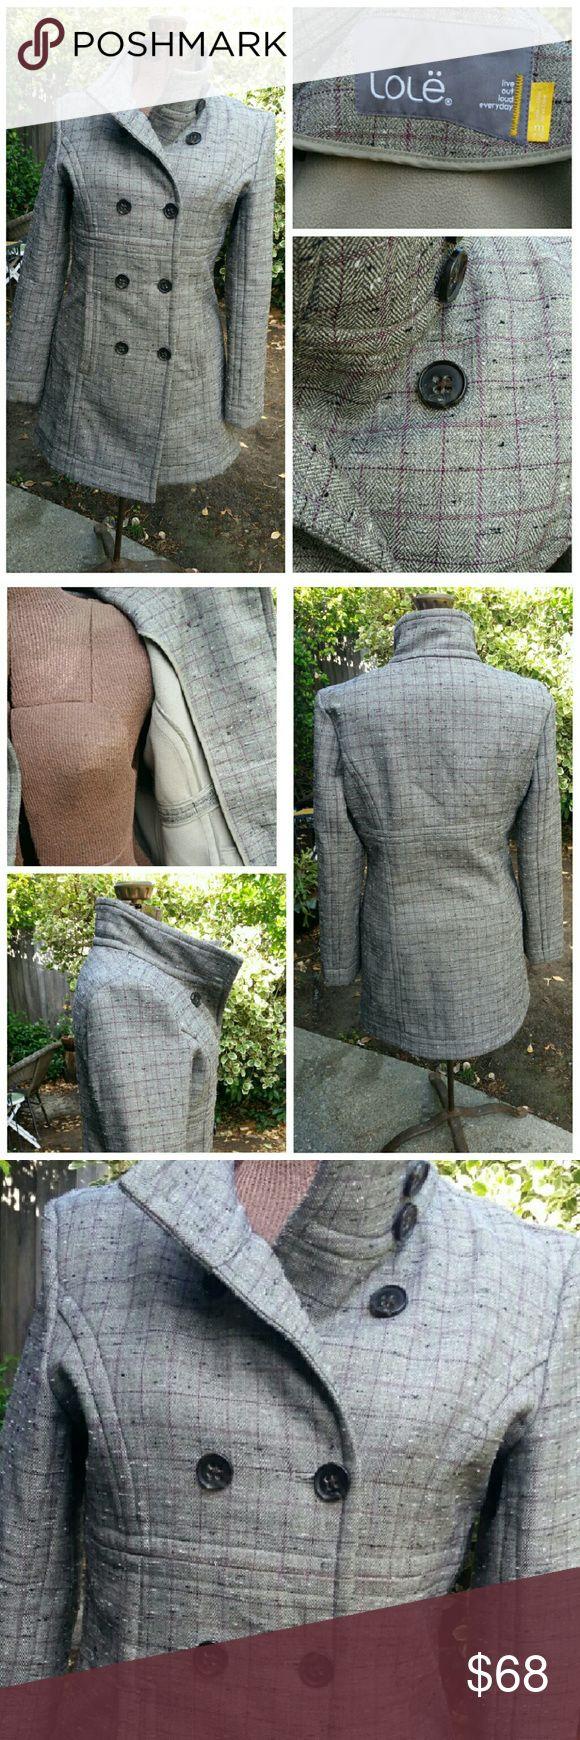 LOLE jacket Very sleek urban jacket with subtle checked pattern Lole Jackets & Coats